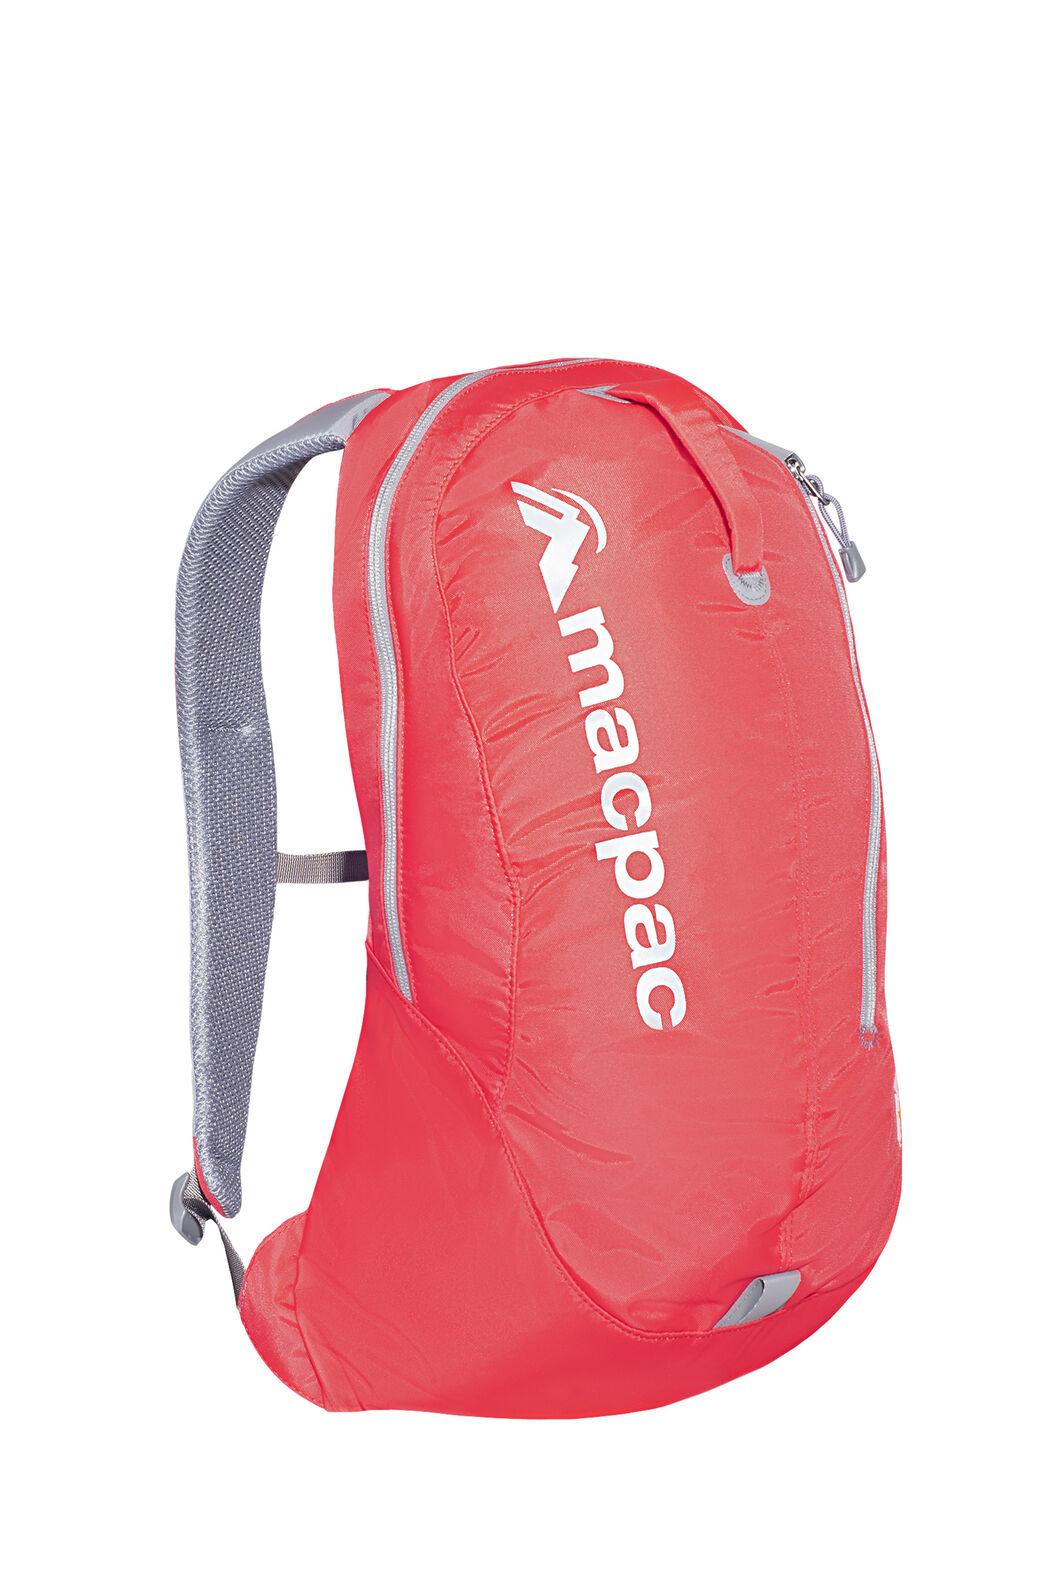 Macpac Kahuna 1.1 18L Backpack, Lollipop, hi-res